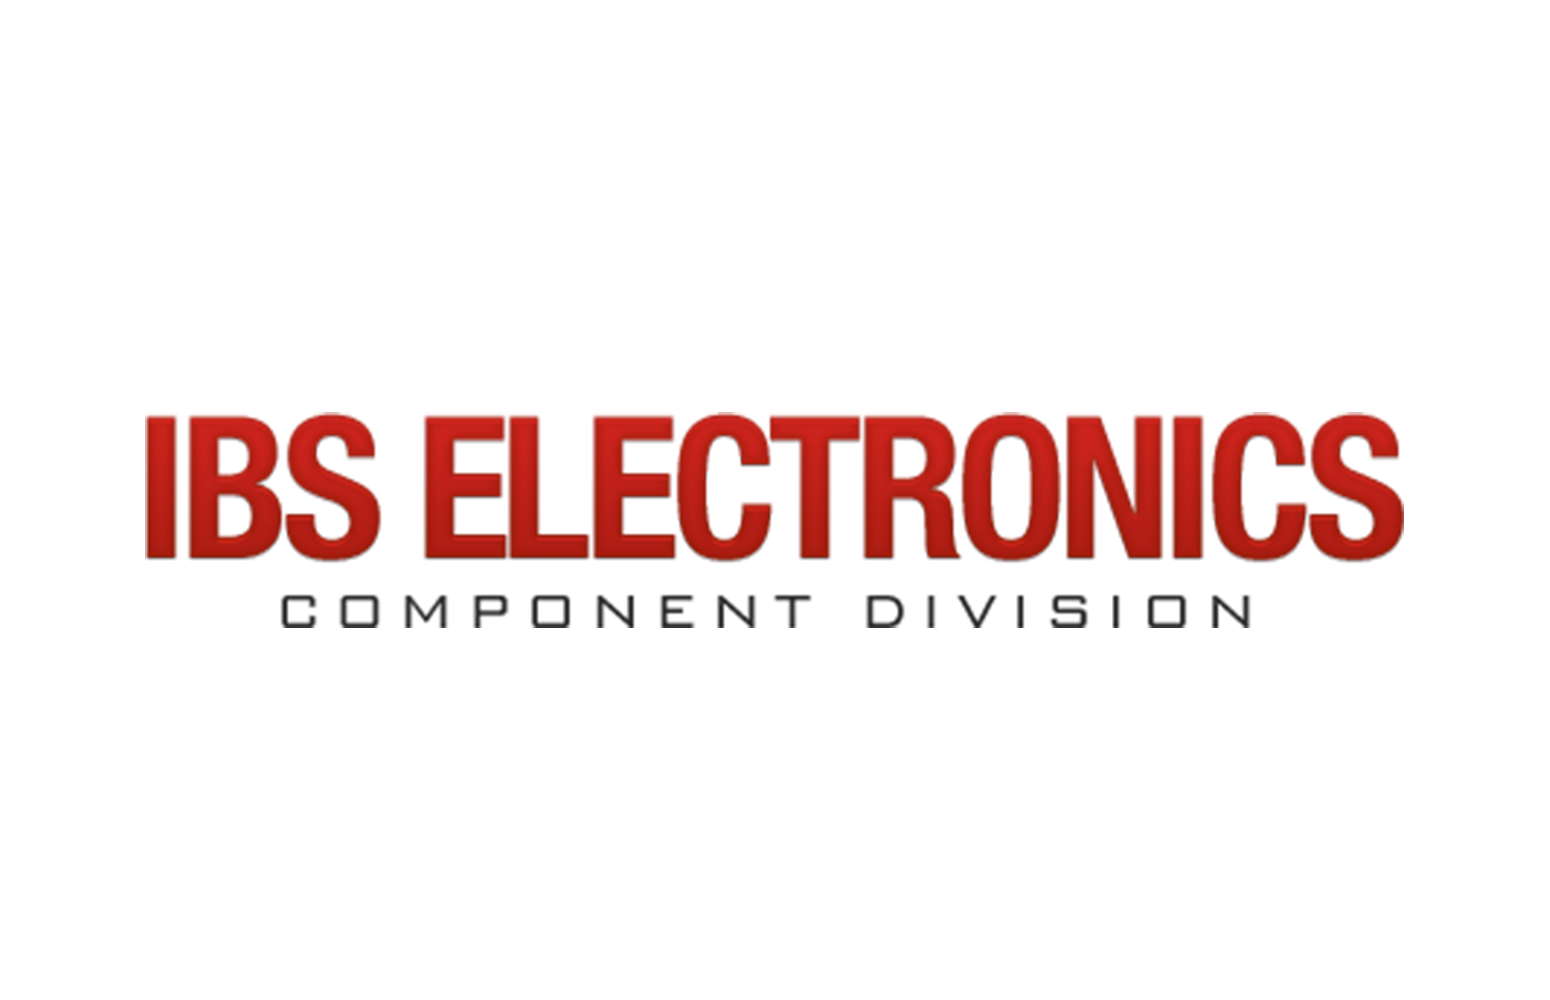 IBS Electronics